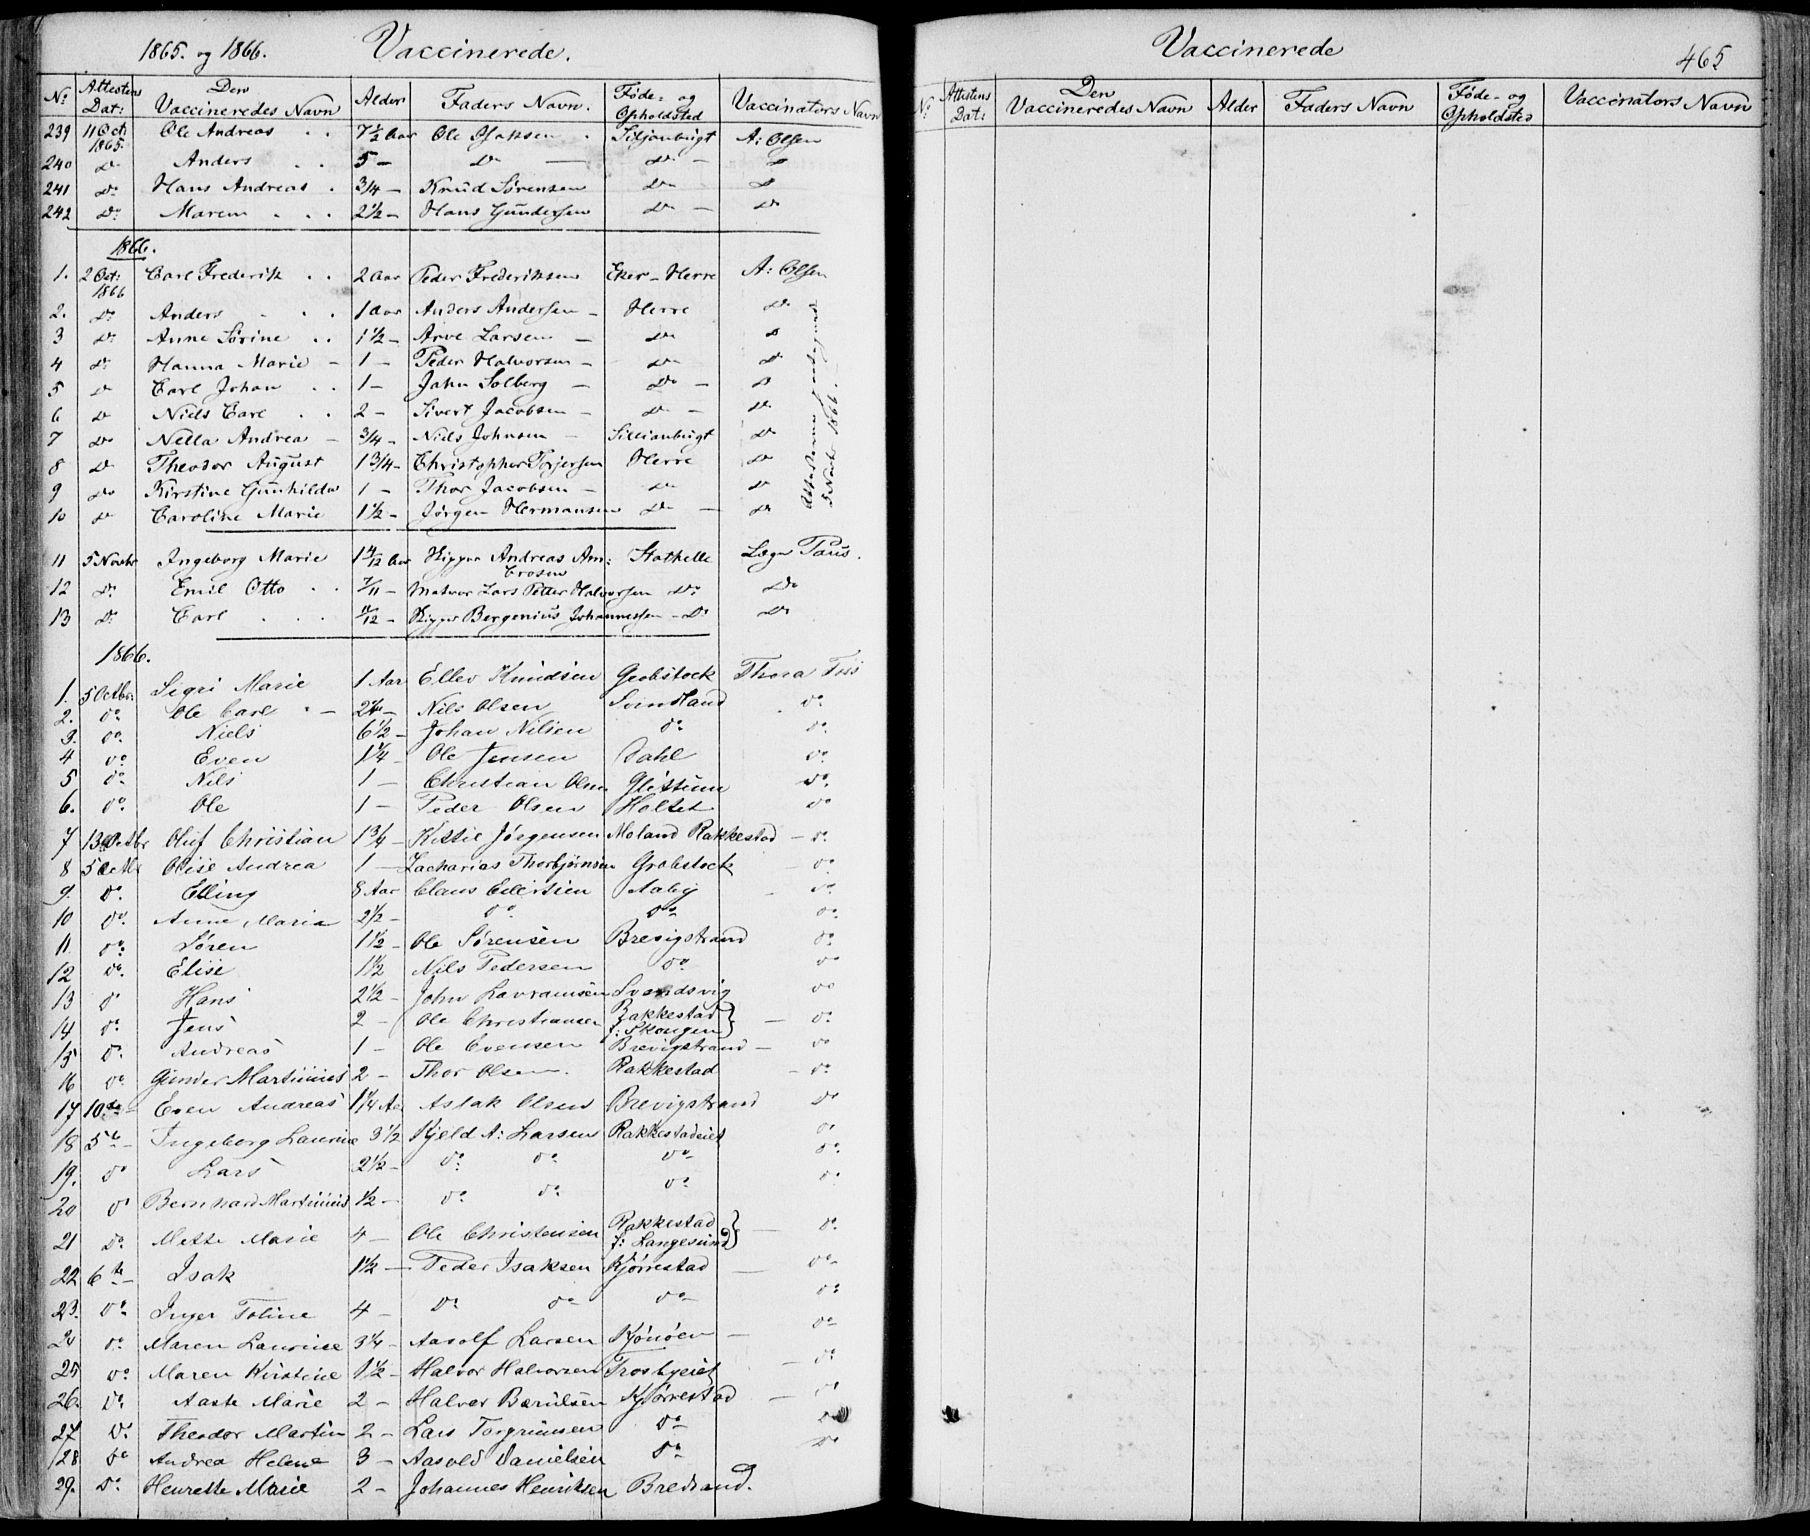 SAKO, Bamble kirkebøker, F/Fa/L0005: Ministerialbok nr. I 5, 1854-1869, s. 465